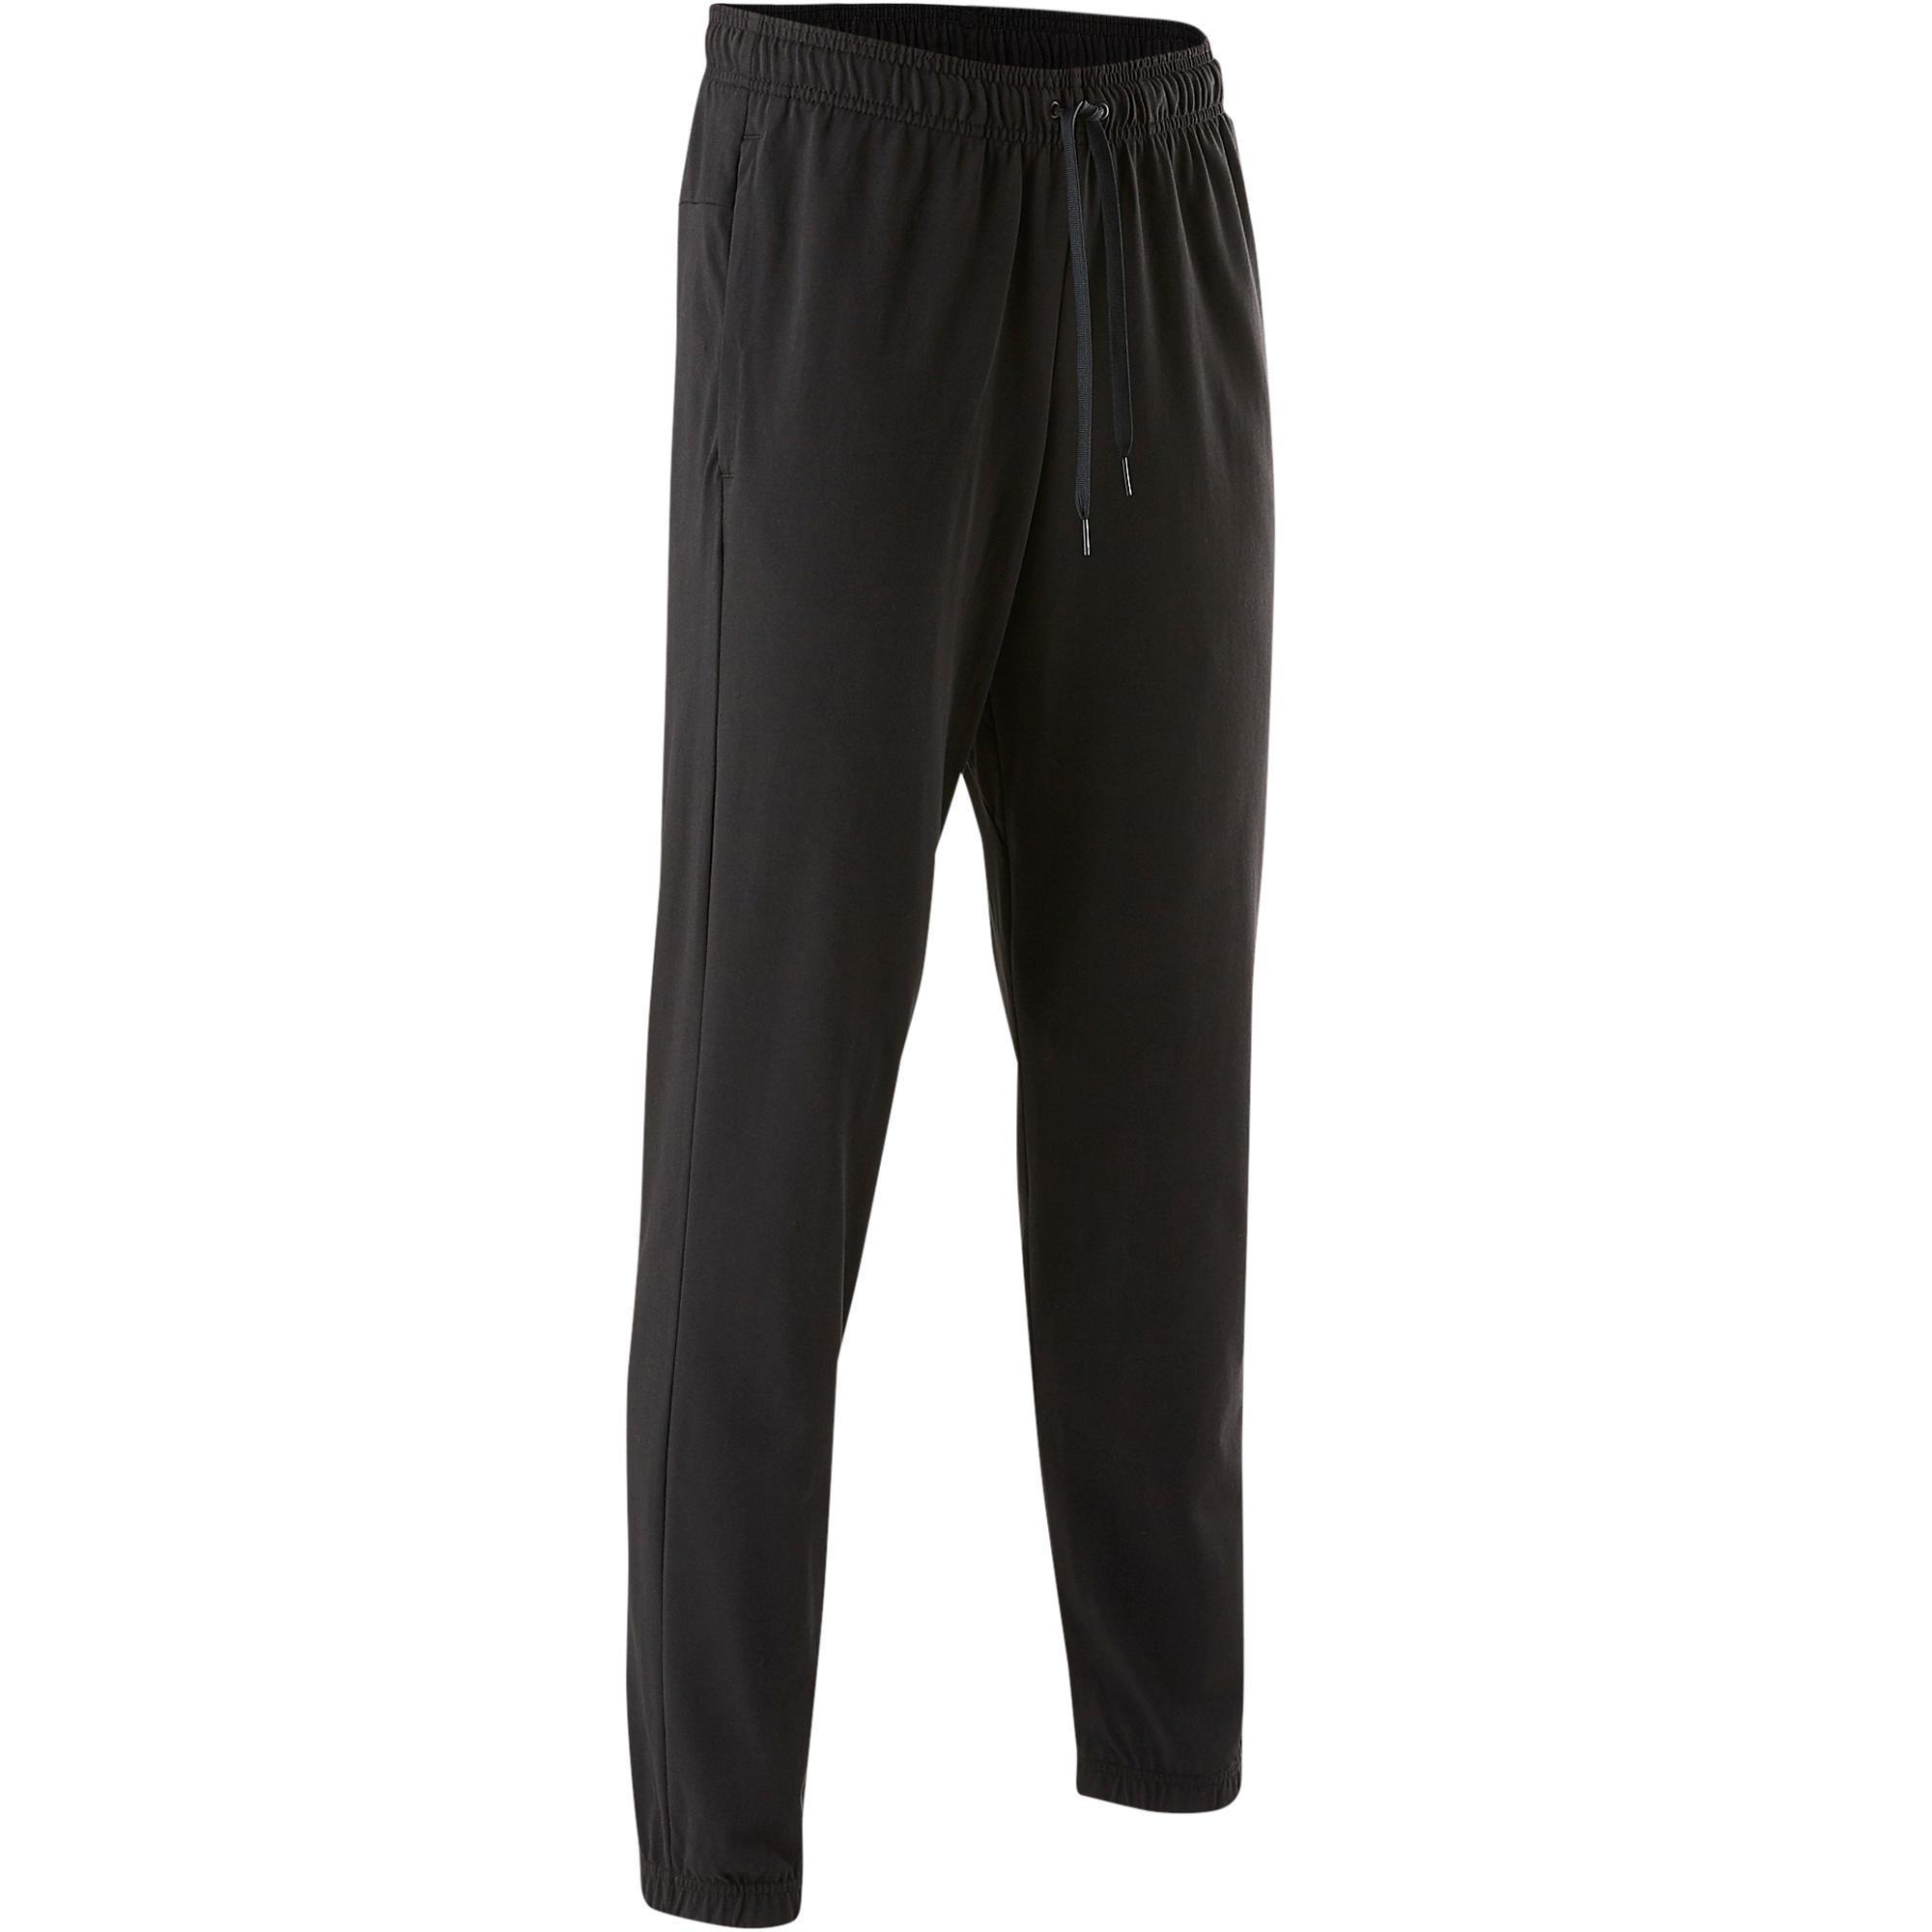 Pantalon De Gimnasia Adidas Coupon For 92a81 7c097